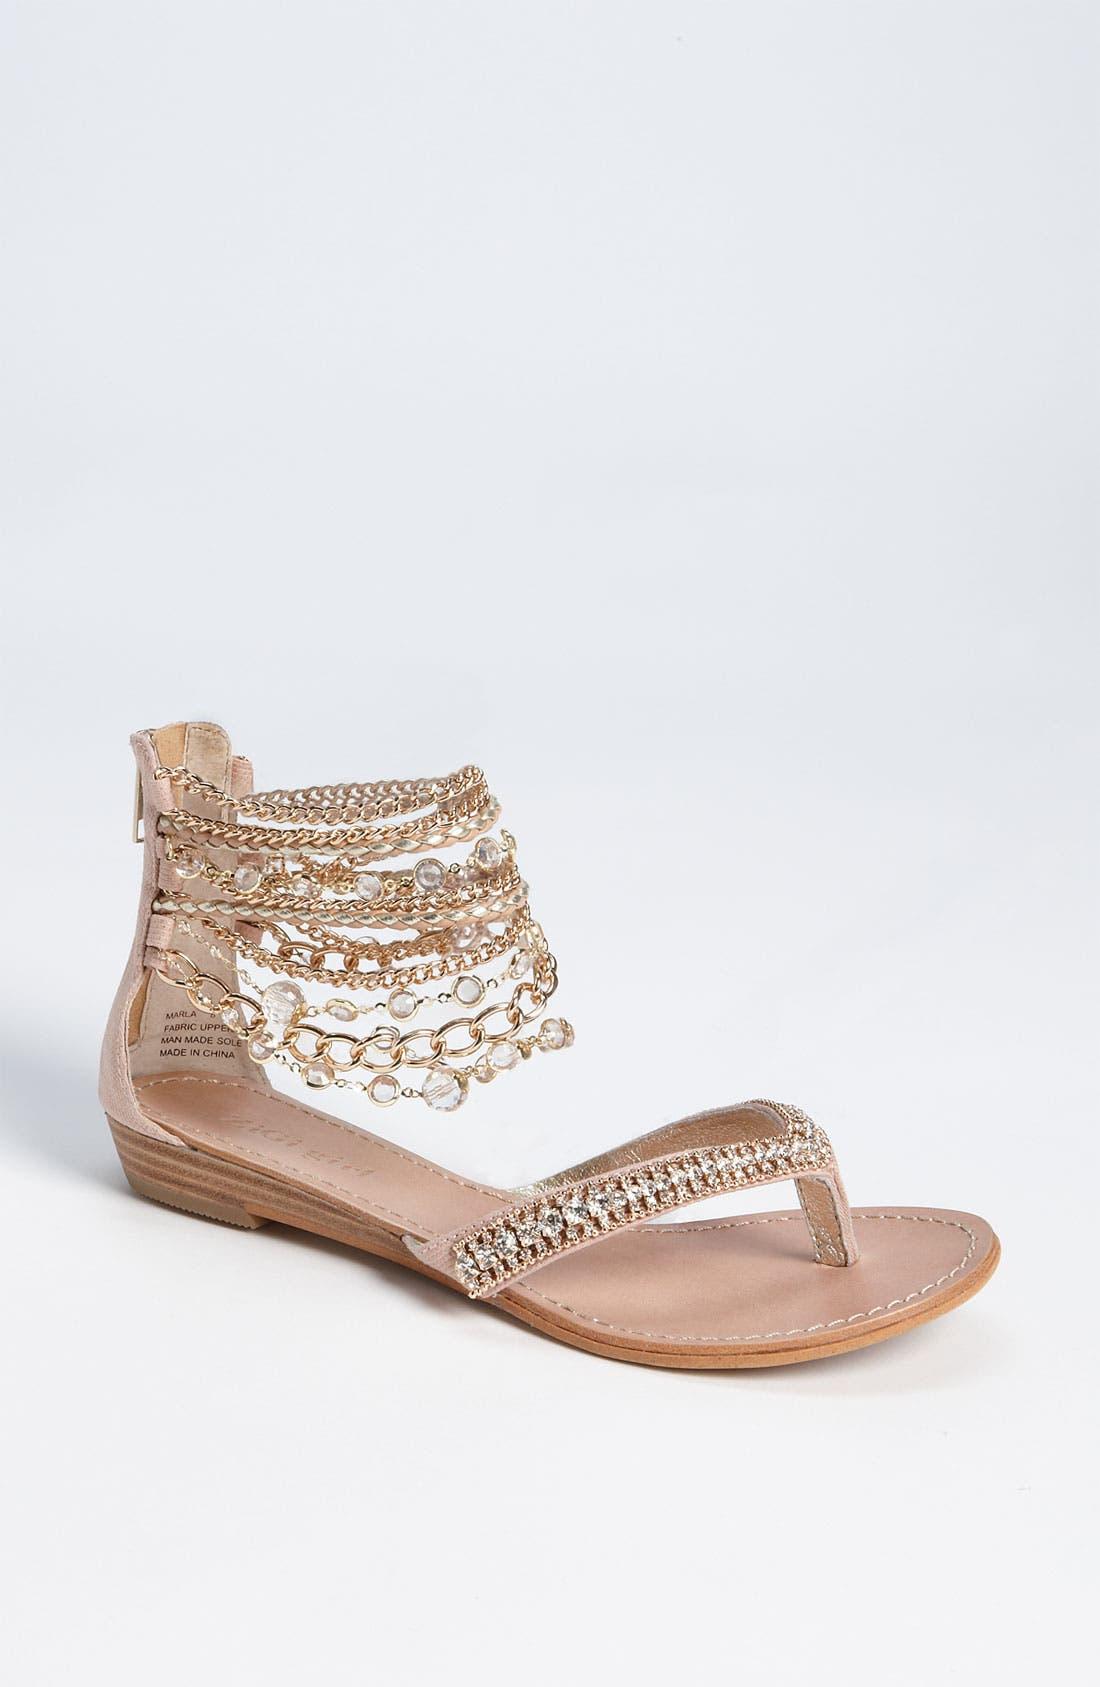 'Marla' Sandal, Main, color, 950